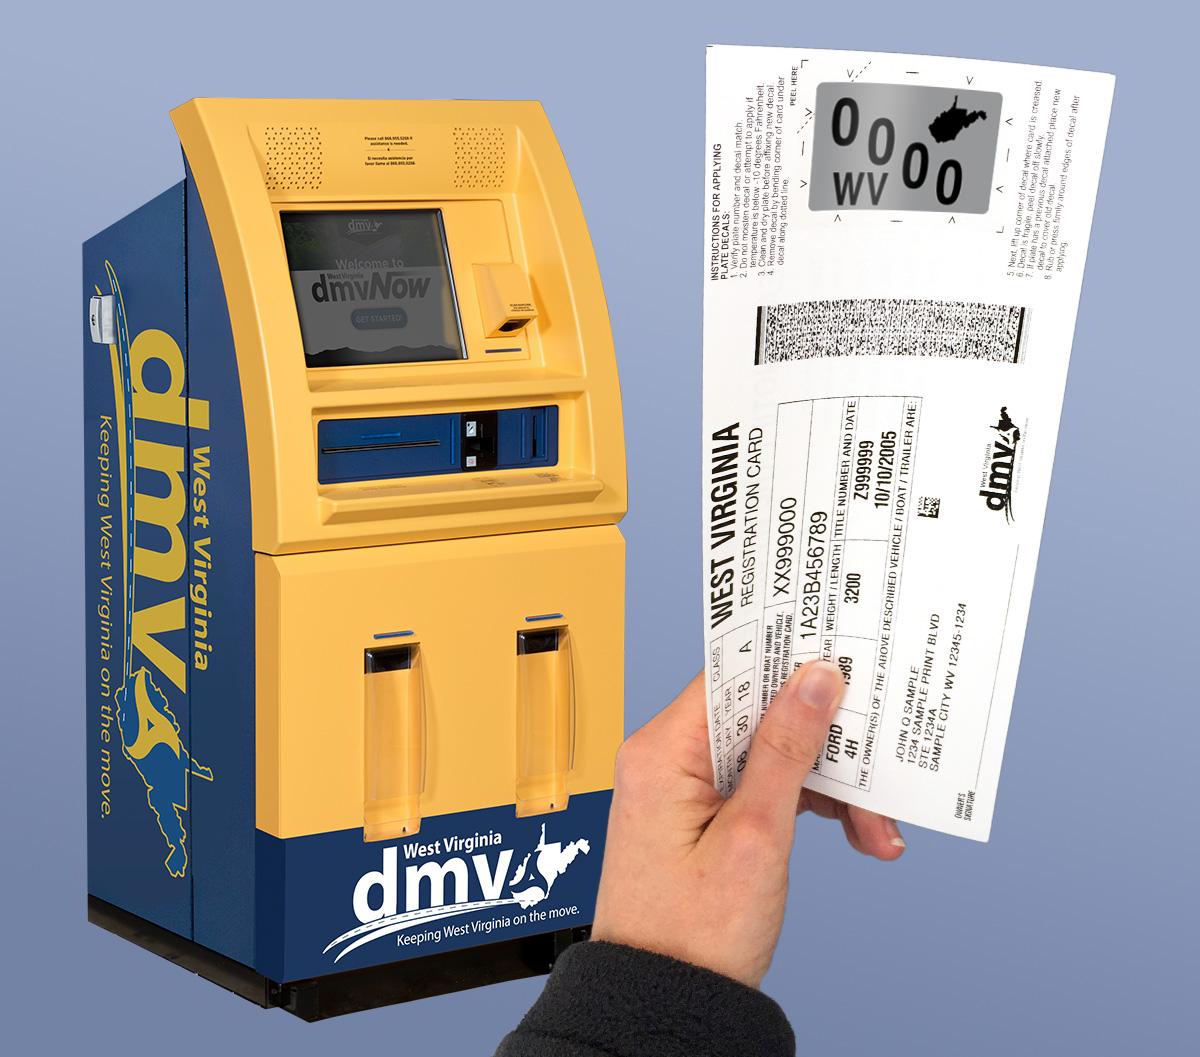 West Virginia DMV announces DMV Now kiosk grand openings at